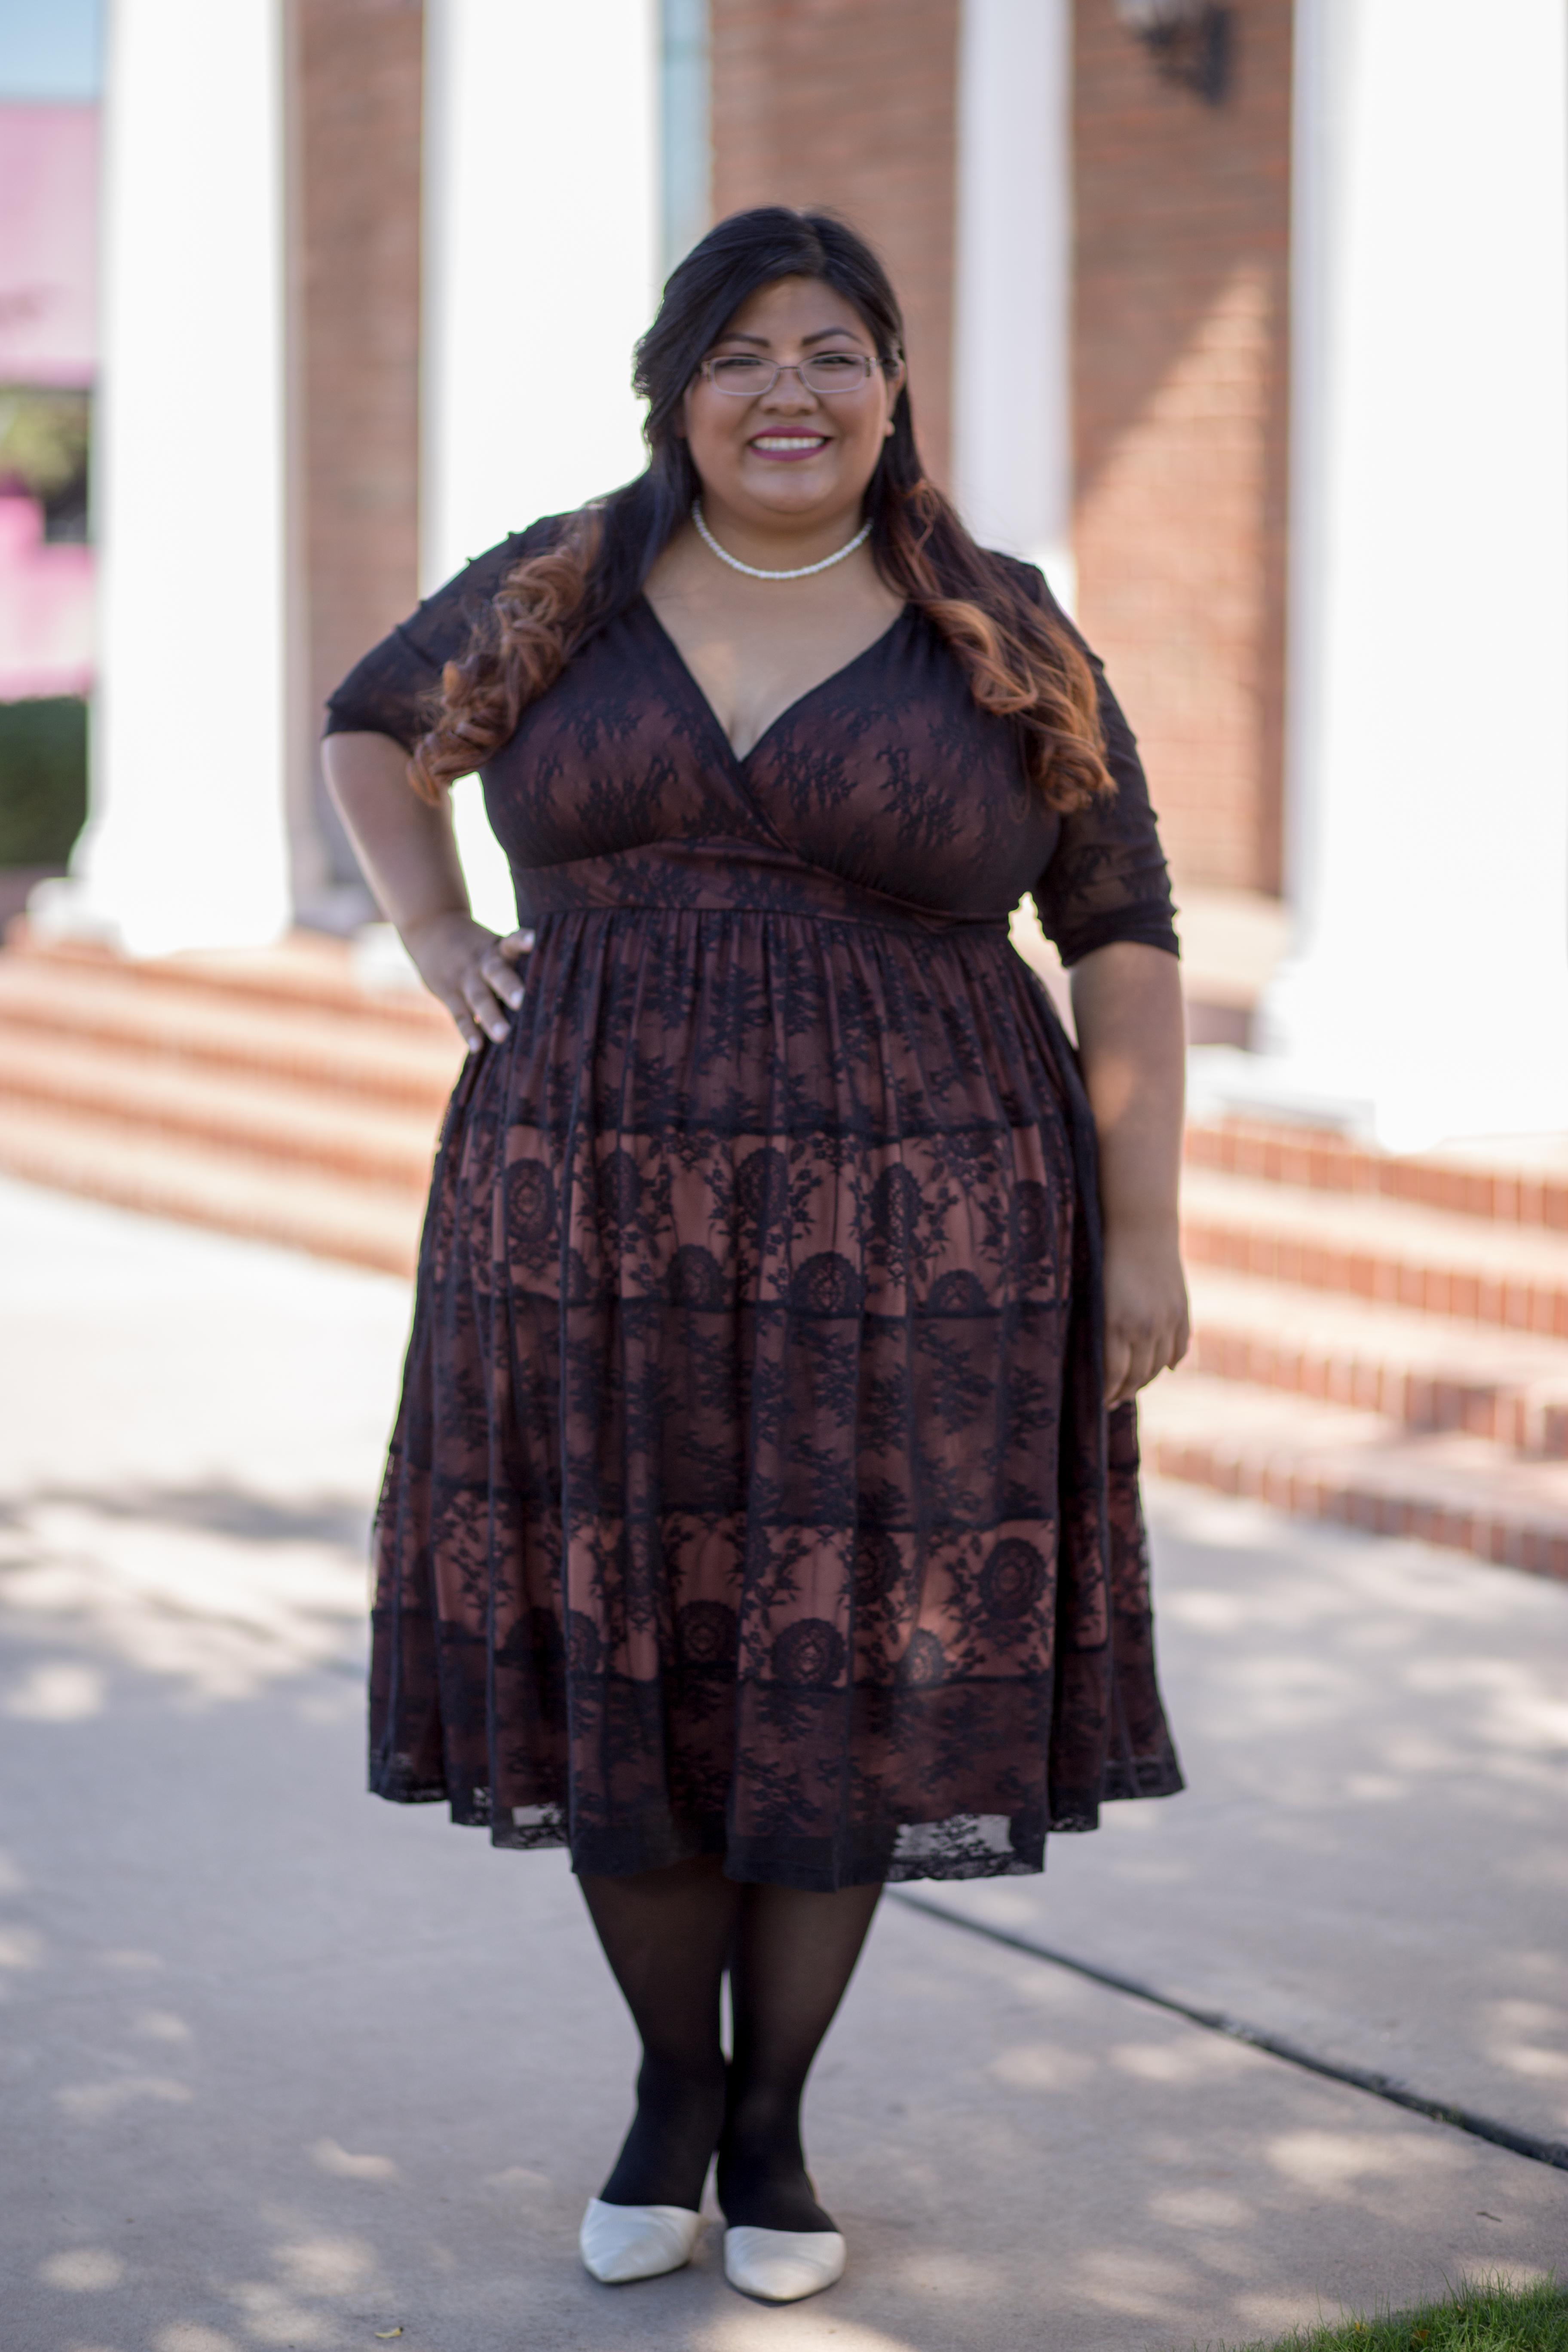 Redstreak Girl wearing Kiyonna Tiers of Joy Dress